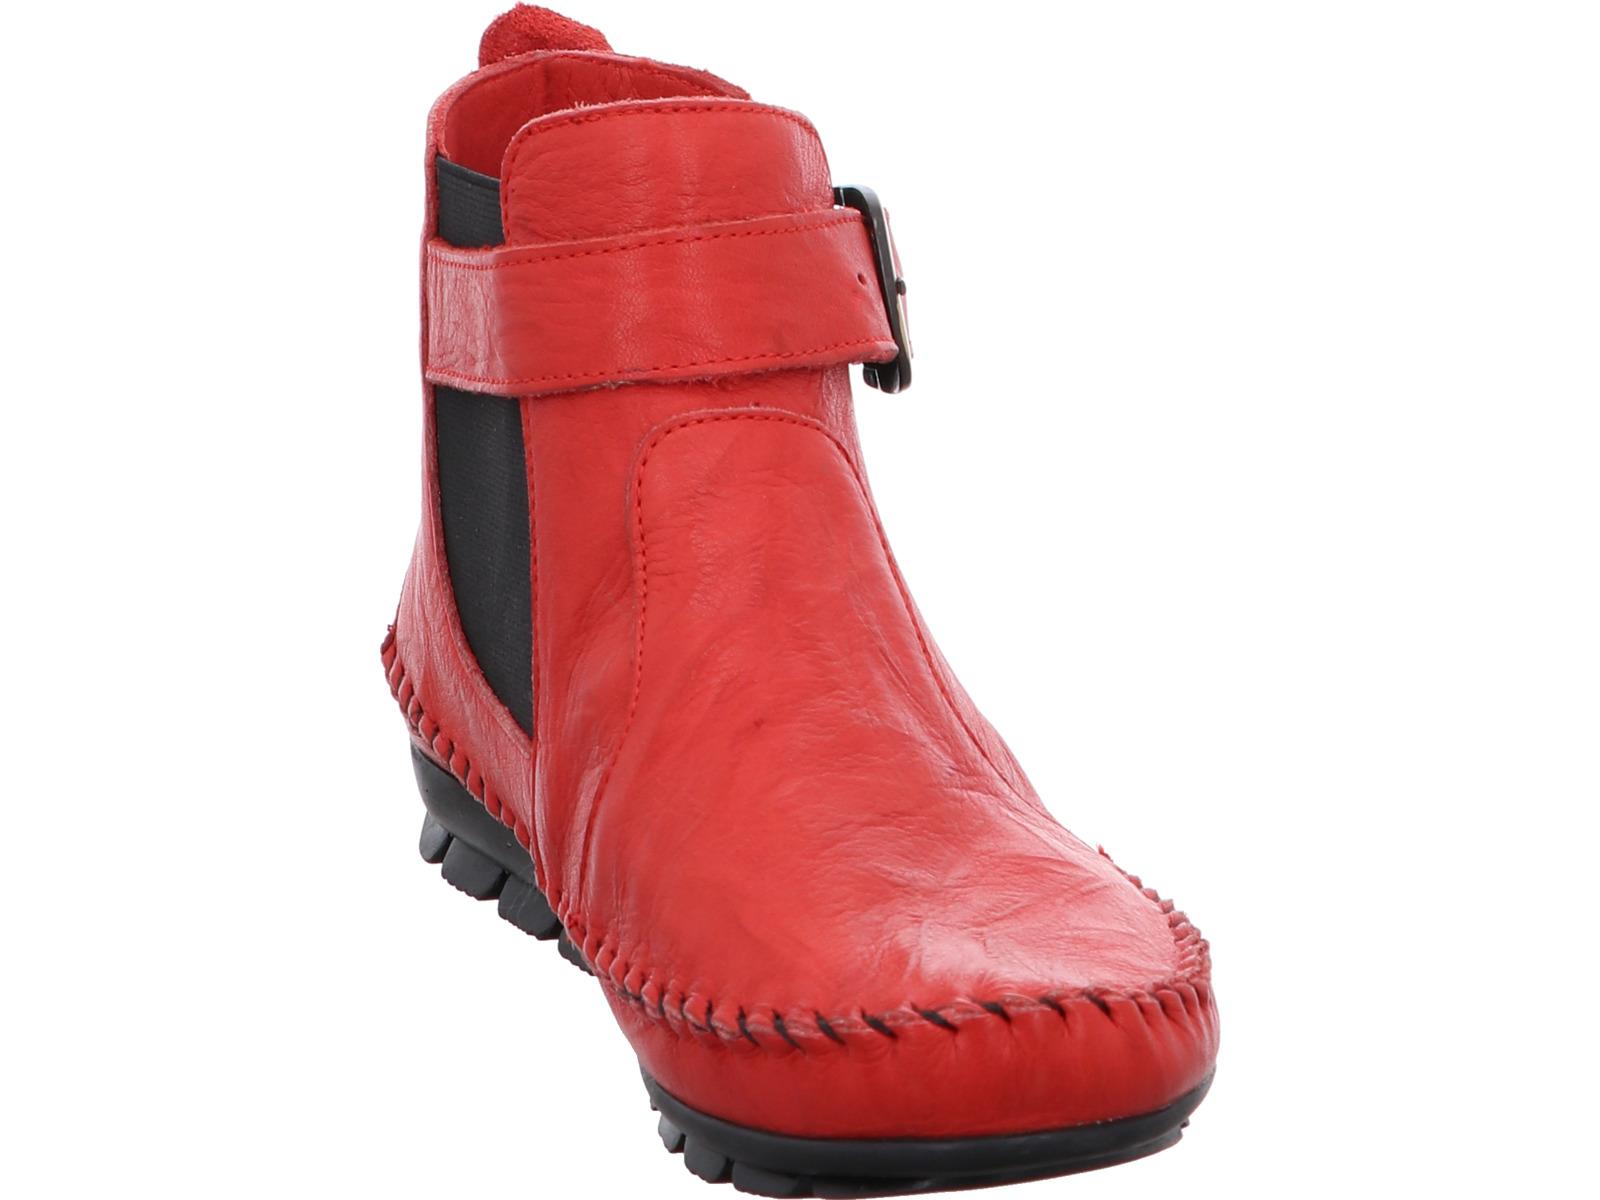 01 Stiefel Damen 031010 Stiefeletten Gemini Leder uXPTwZiOkl